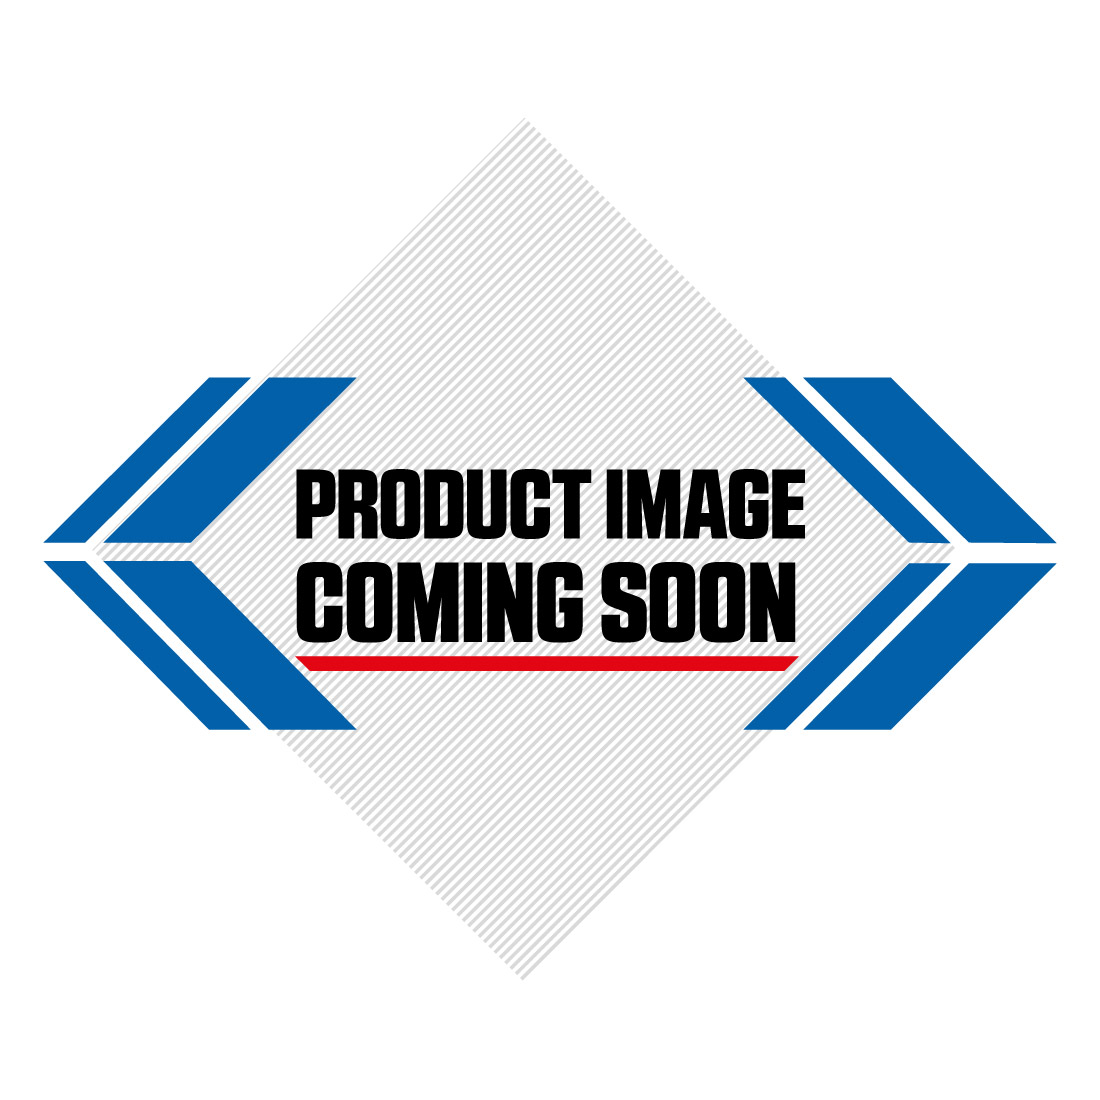 UFO KTM Plastic Kit SX 125 150 250 SXF 250 350 450 (16-18) OEM 16 Image-1>